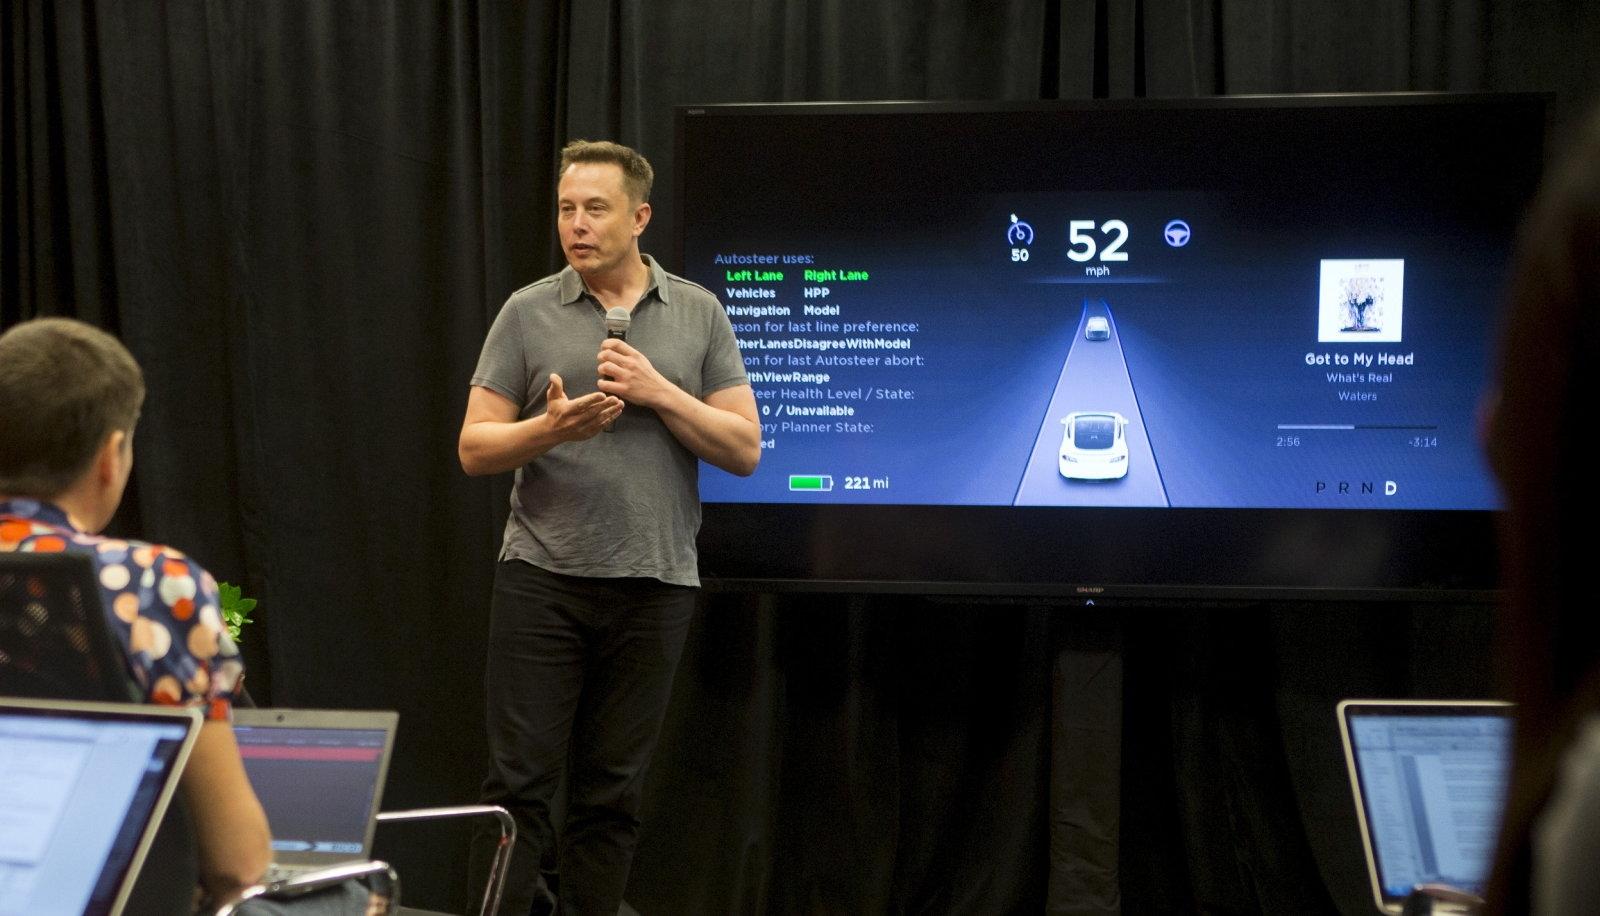 Tesla: Autopilot was engaged in fatal Model X crash | DeviceDaily.com